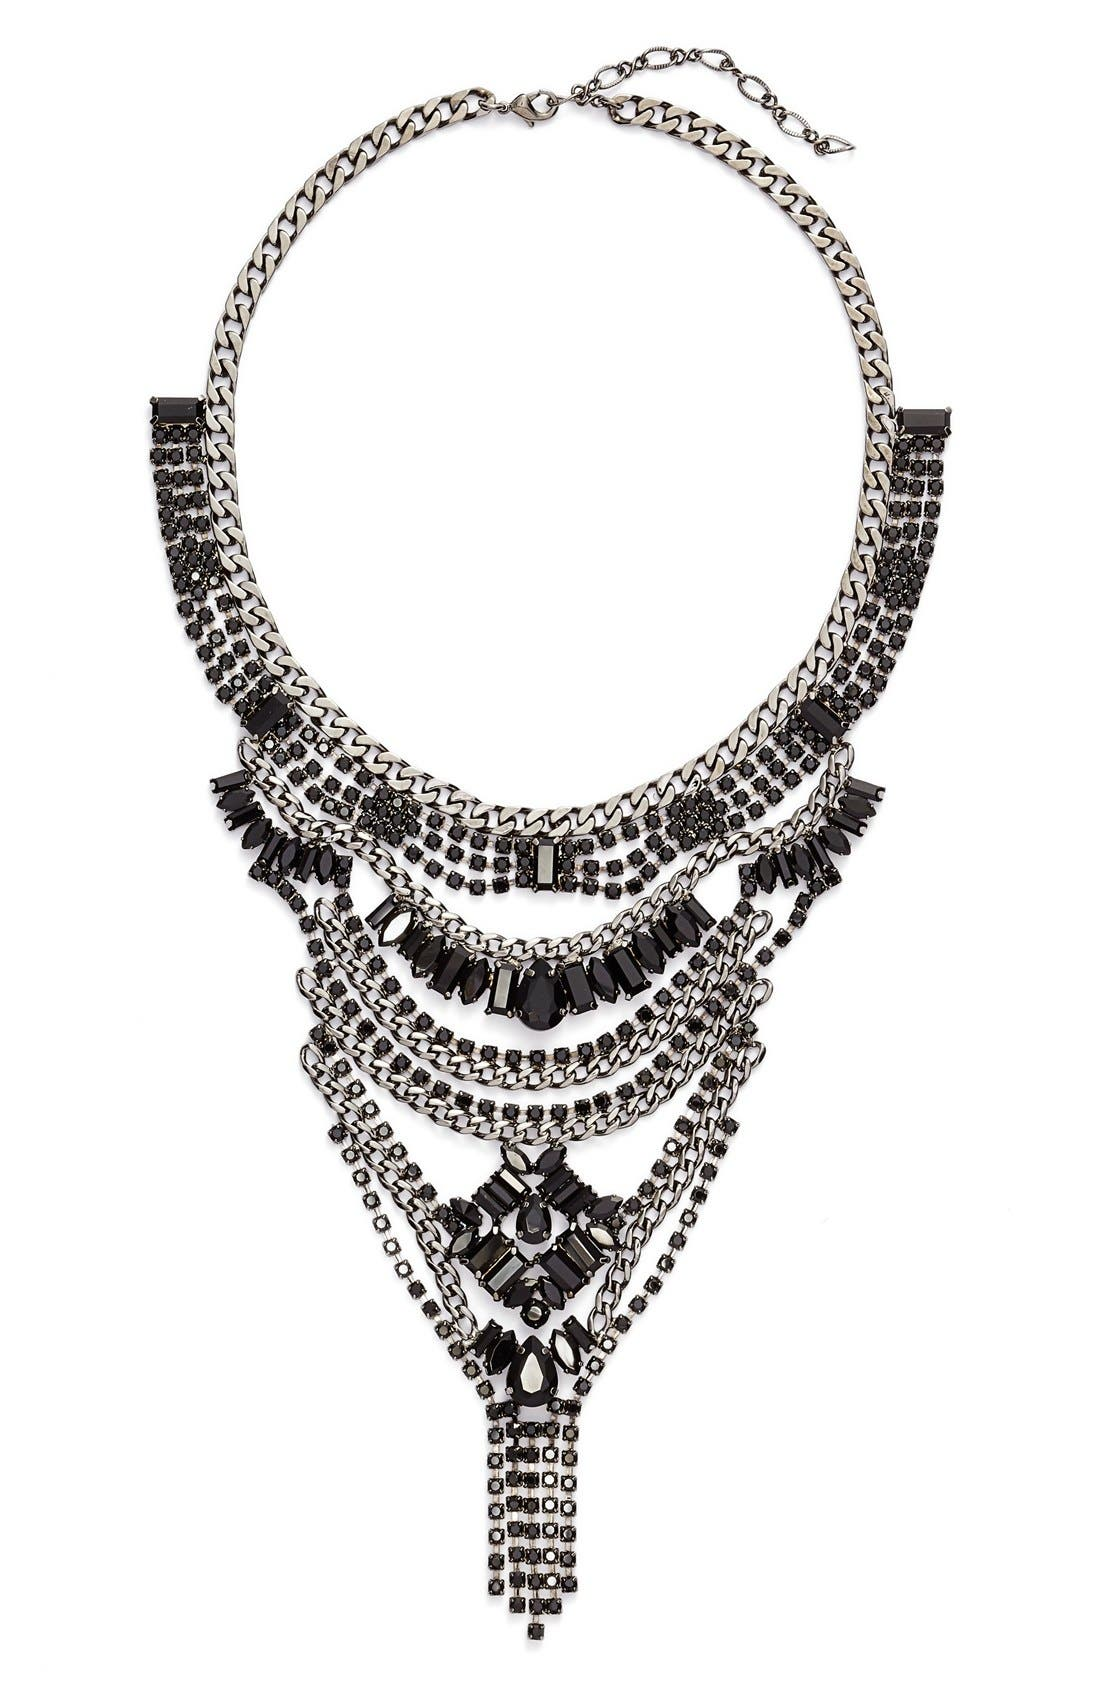 Alternate Image 1 Selected - Cristabelle Multilayered Crystal Bib Necklace